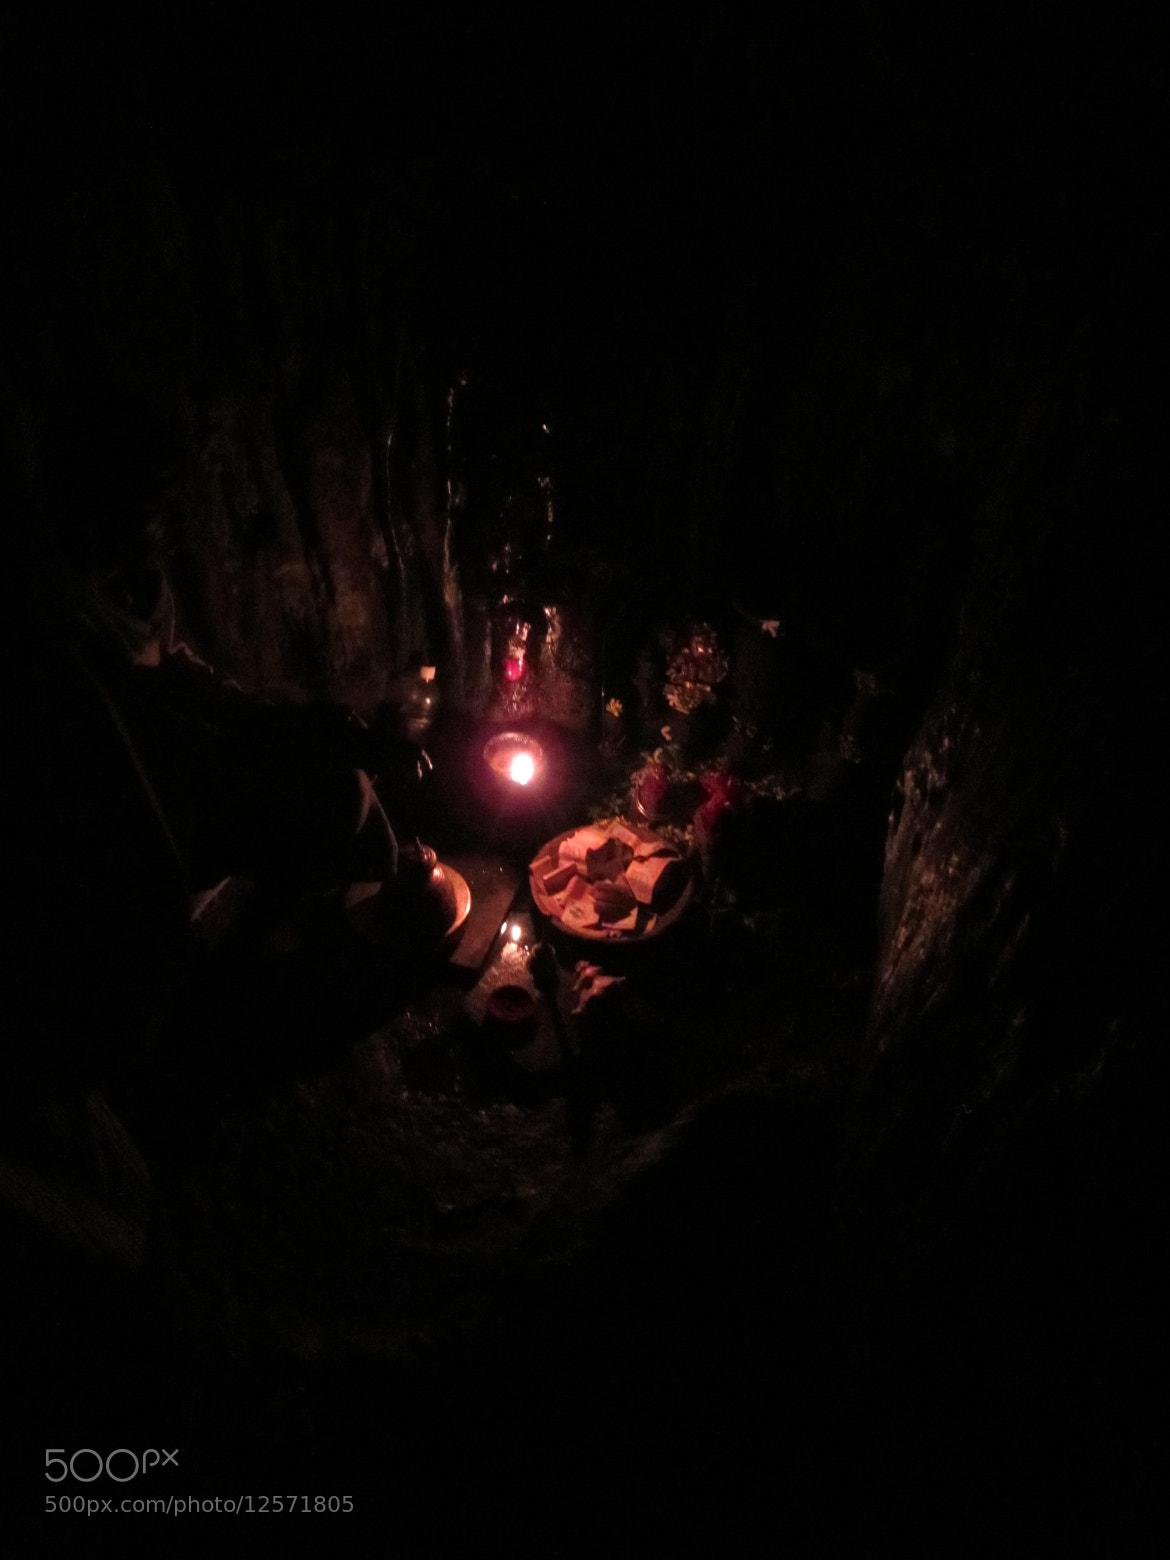 Photograph rare light inside a cave by lokesh goyal on 500px